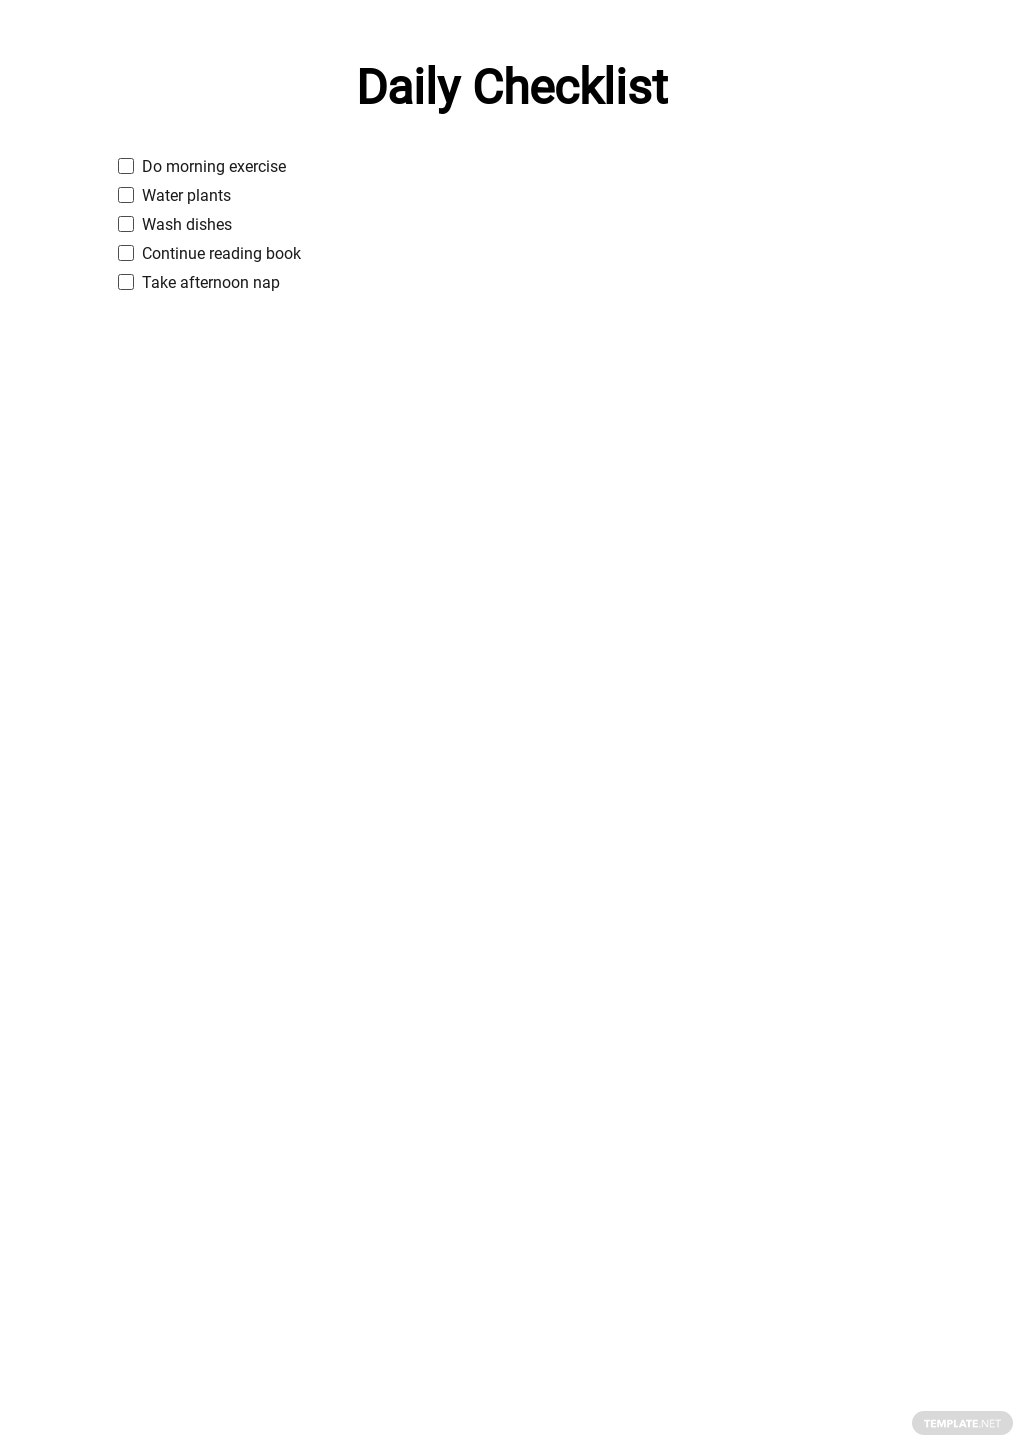 Daily Checklist Template.jpe